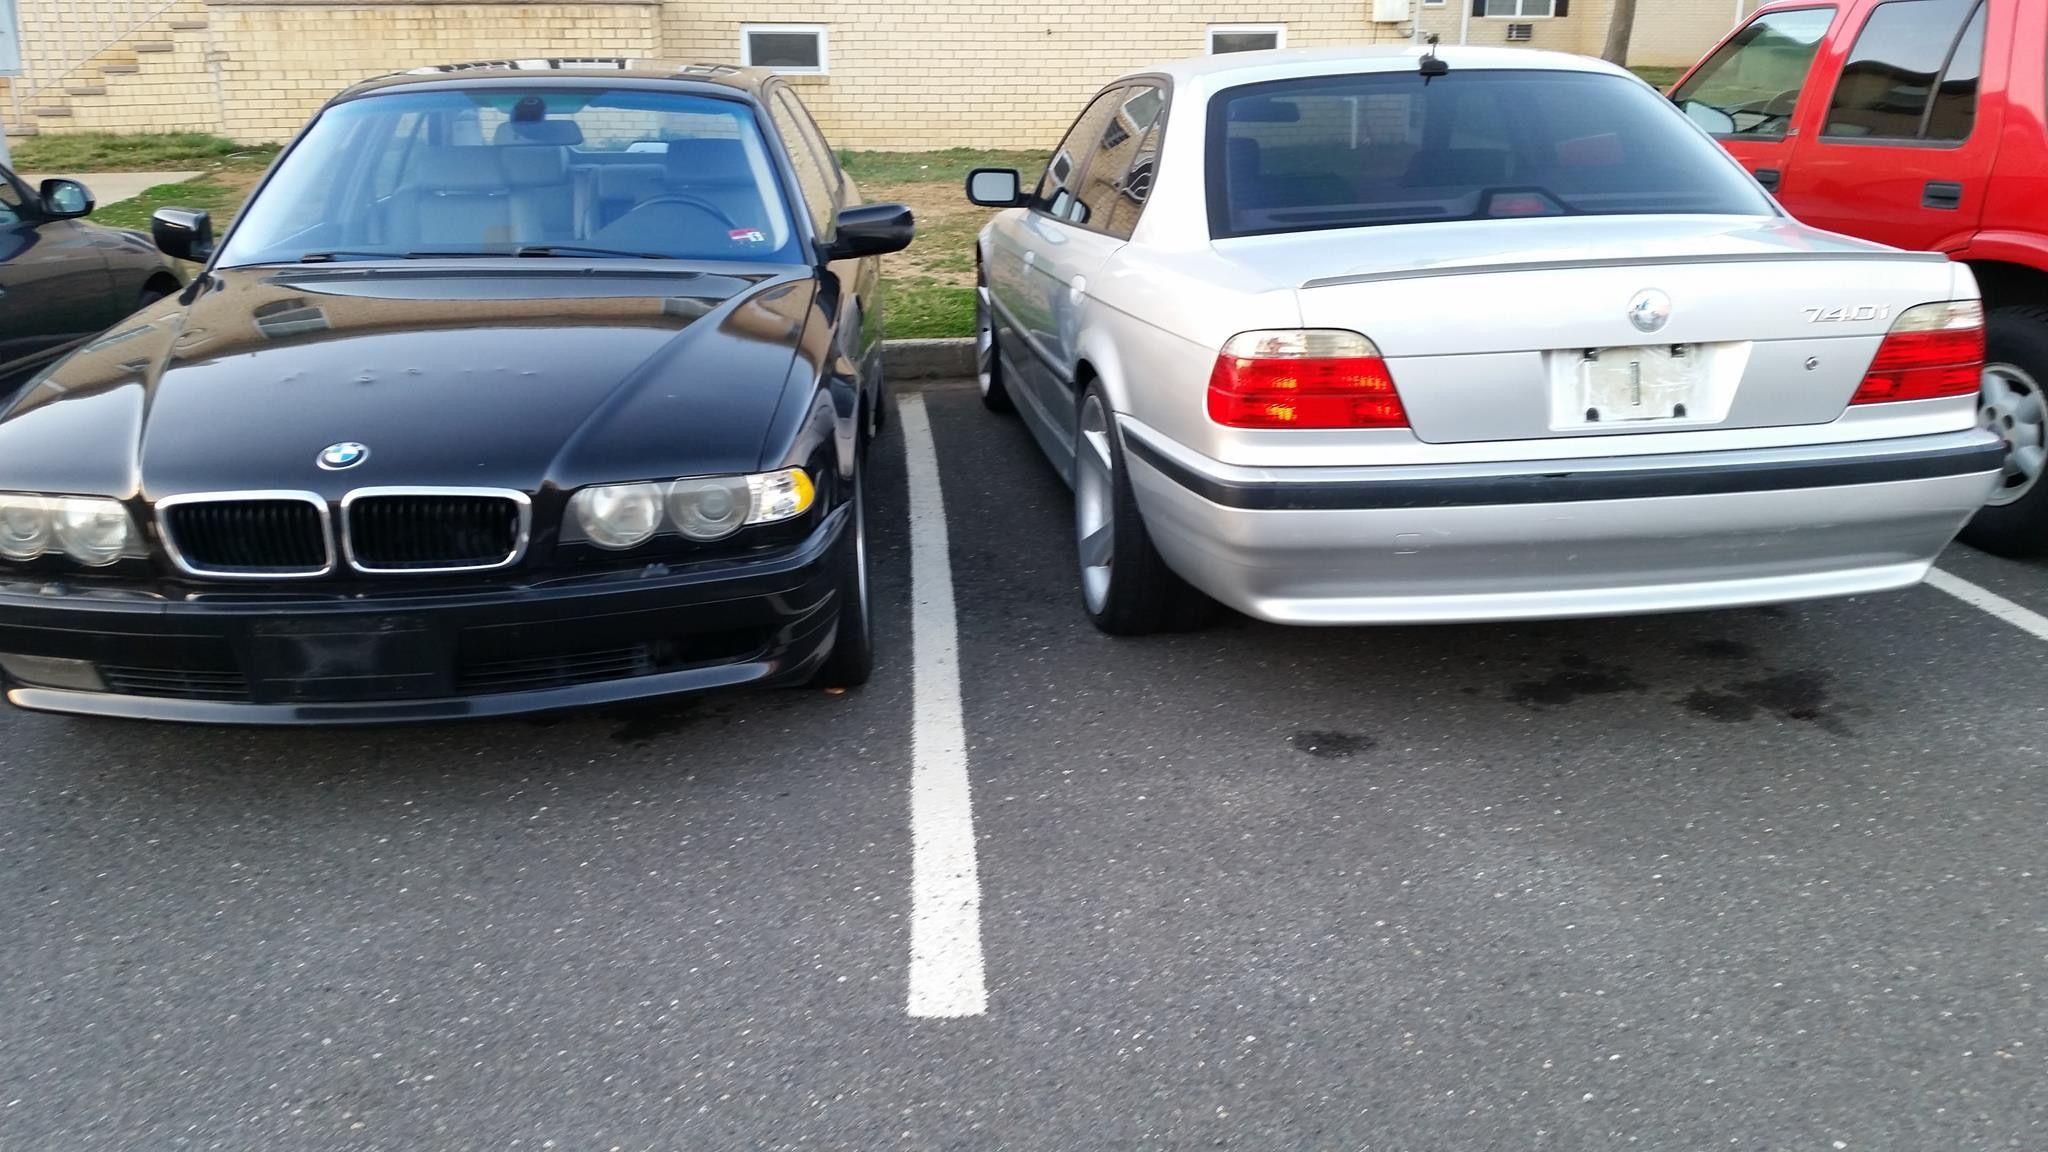 Bmw E38 Black And Silver Bmw E38 Bmw Bmw E38 Bmw 740